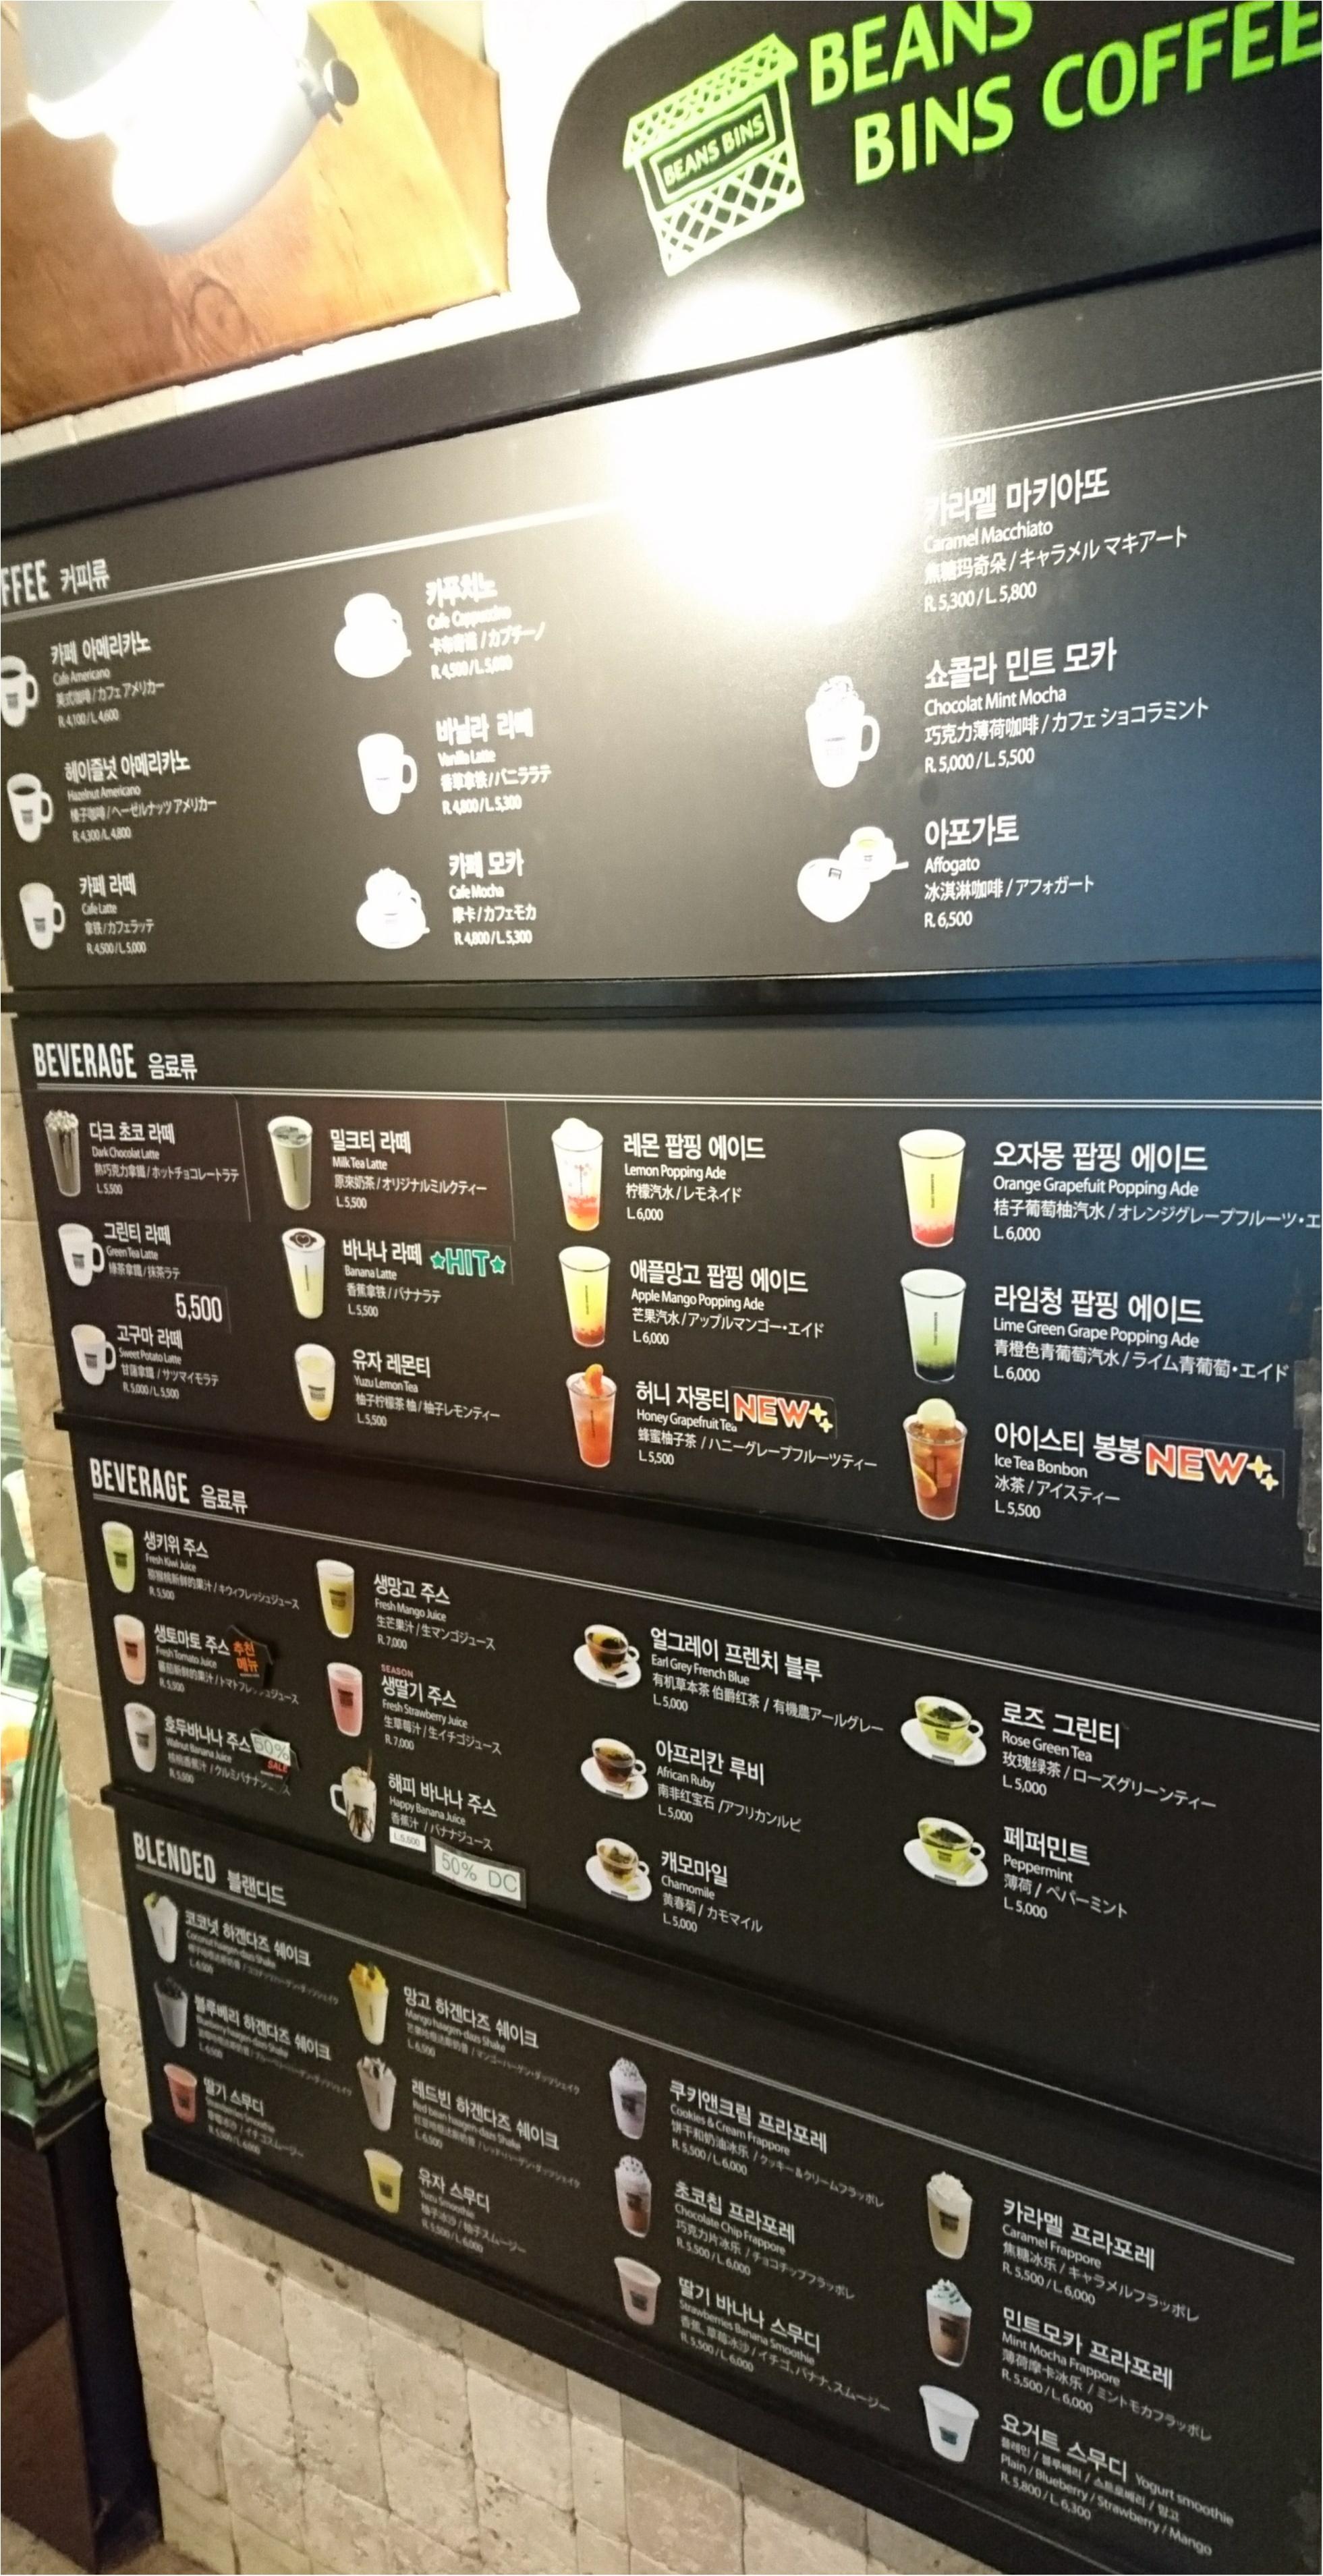 【trip】ソウルに行ったら絶対食べたい!ひそかに話題沸騰のインスタ映えワッフル♡_3_3